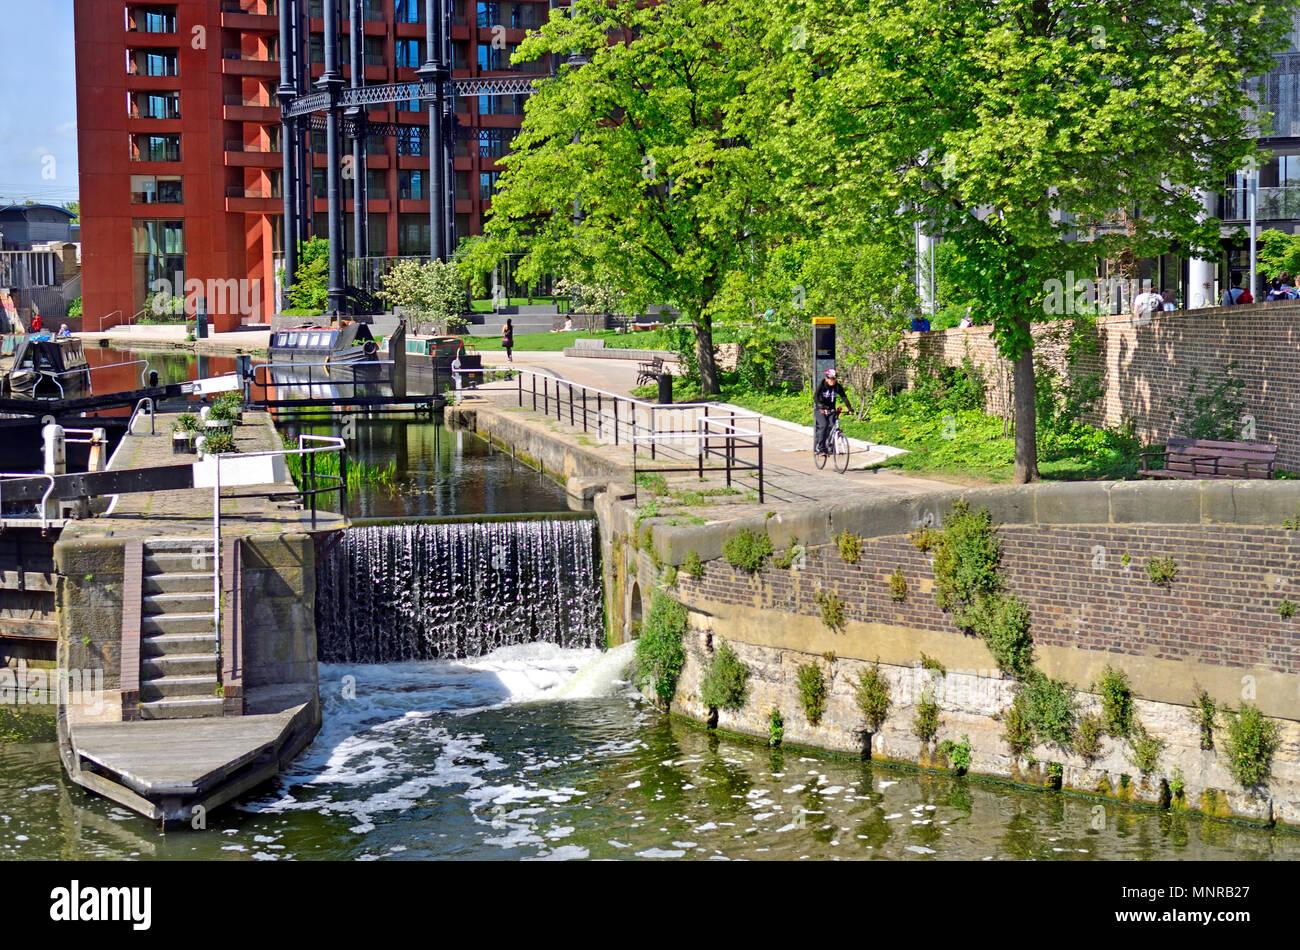 St Pancras Lock, Regent's Canal,  Kings Cross, London, England, UK. - Stock Image